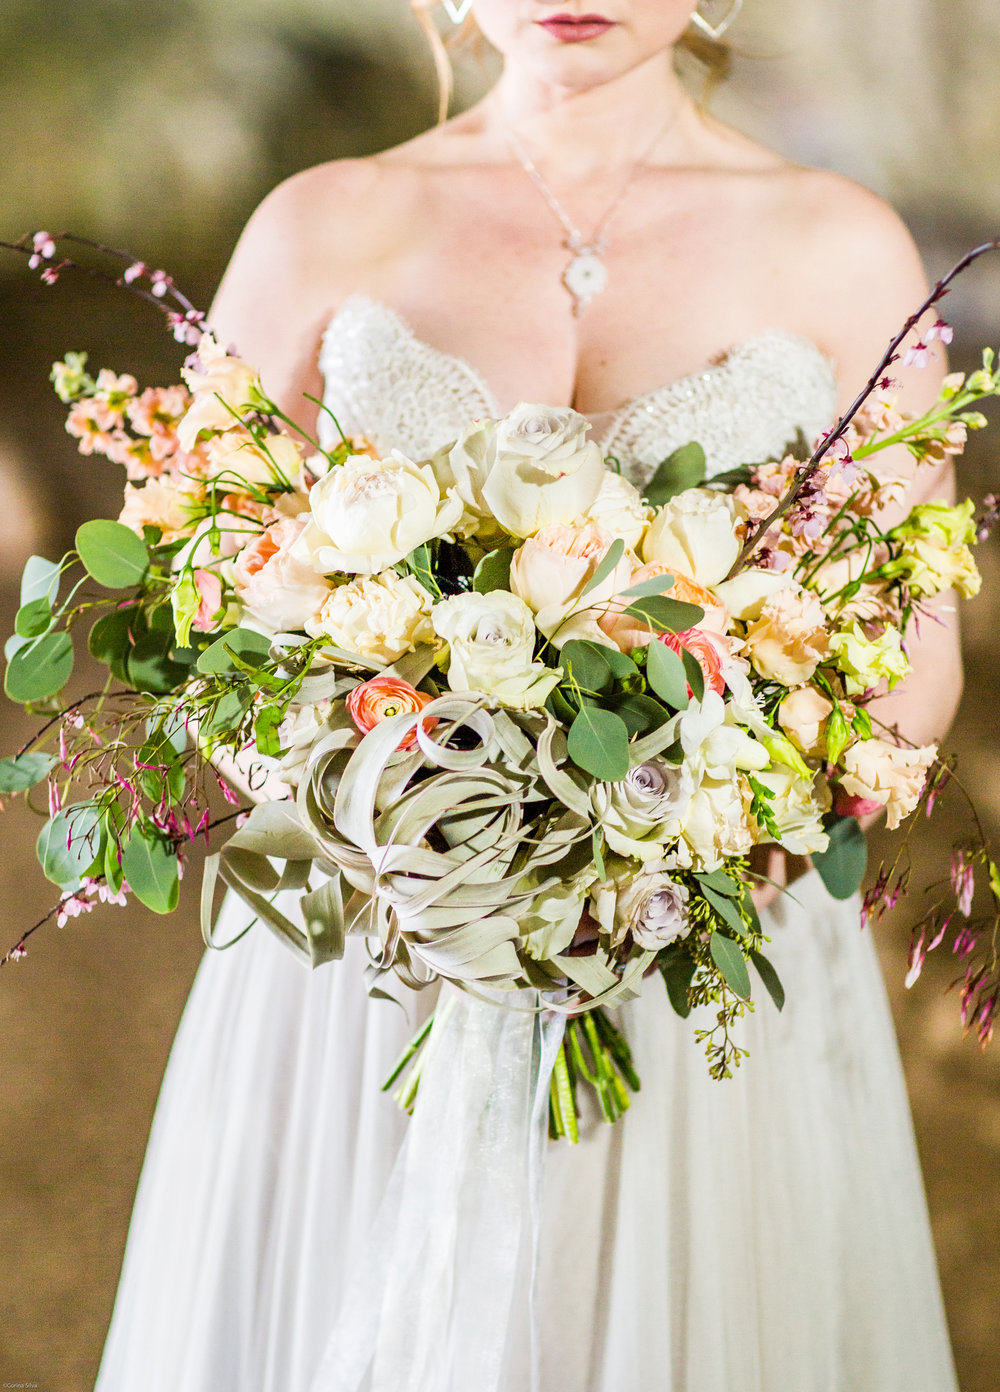 Silver Falls-elopement-bride-and-groom-photo Corina Silva Studios-13.jpg